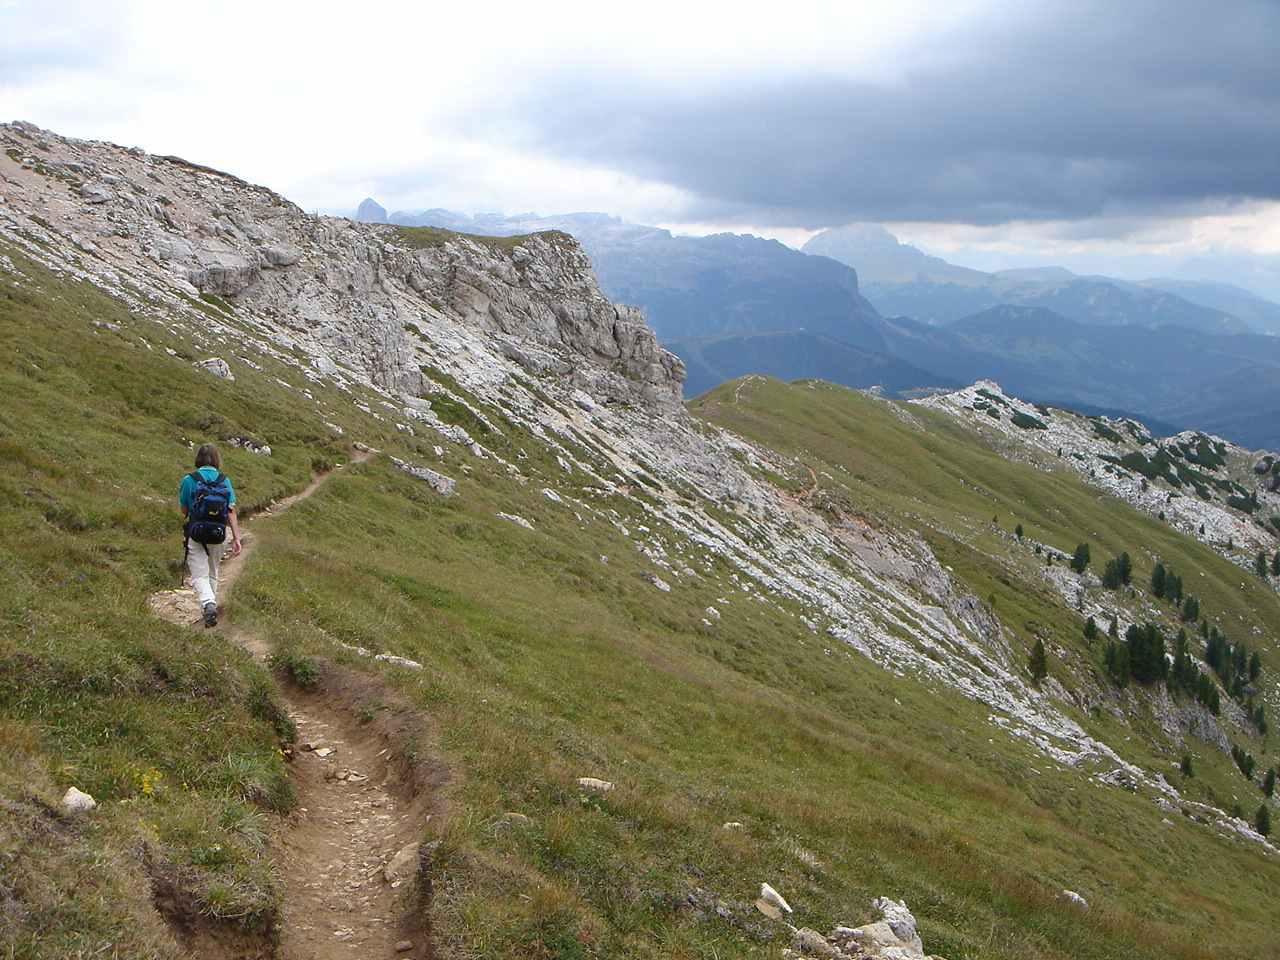 Foto: Manfred Karl / Wander Tour / Settsass (2571m) / Abstieg vom Settsass gegen Le Pizzade, im Hintergrund Sellastock. / 05.05.2007 18:55:36